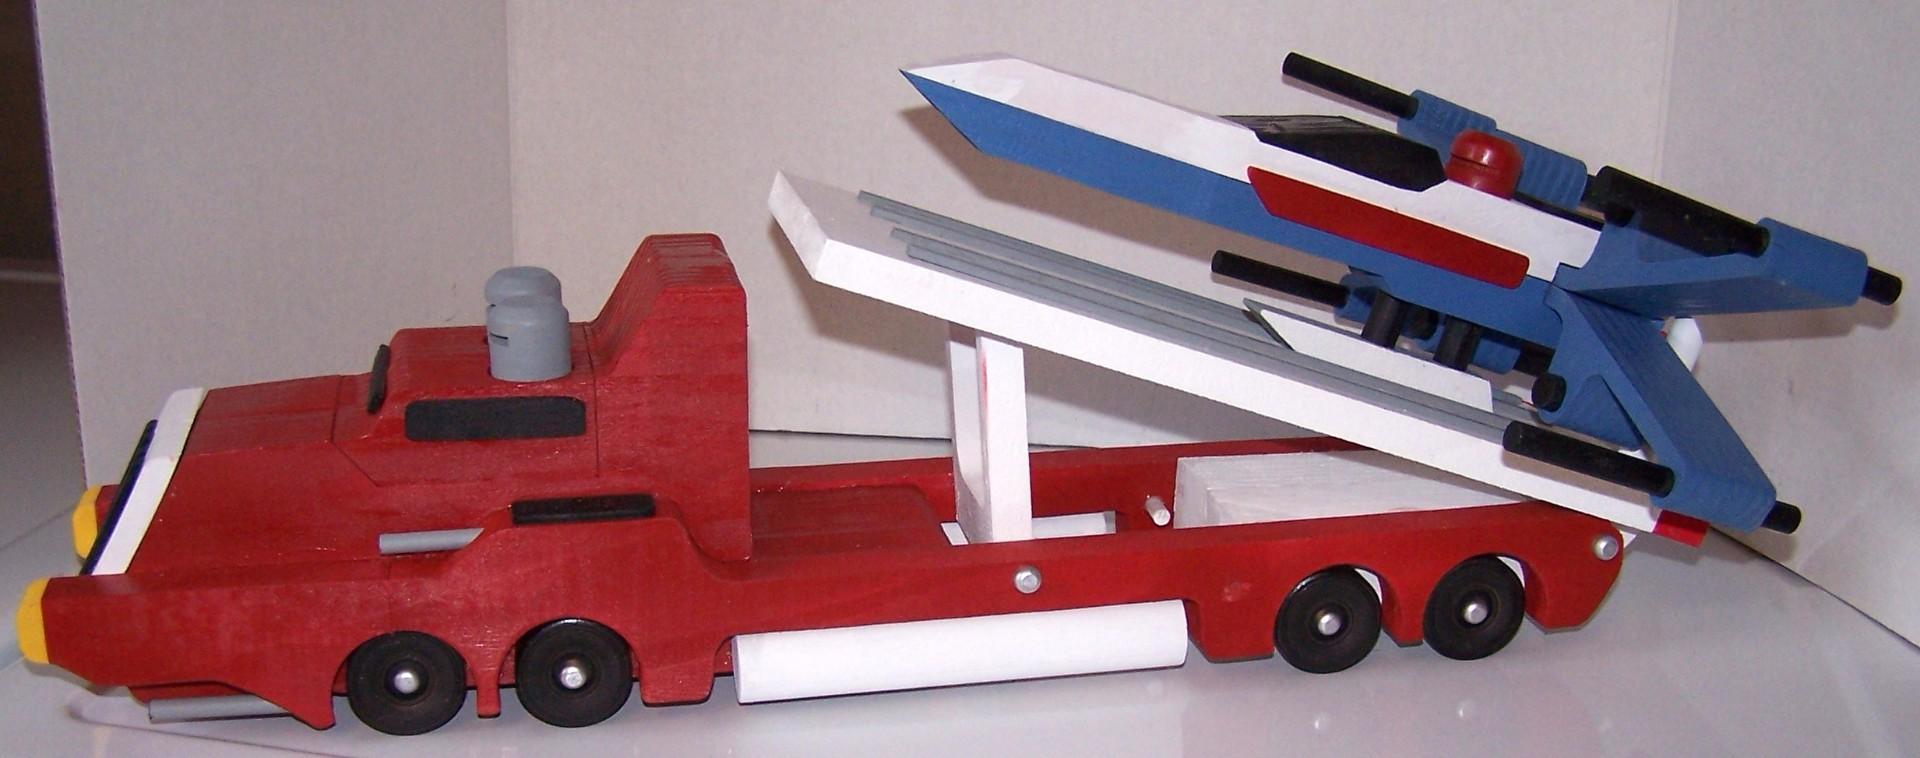 X-Wing Transport4.JPG